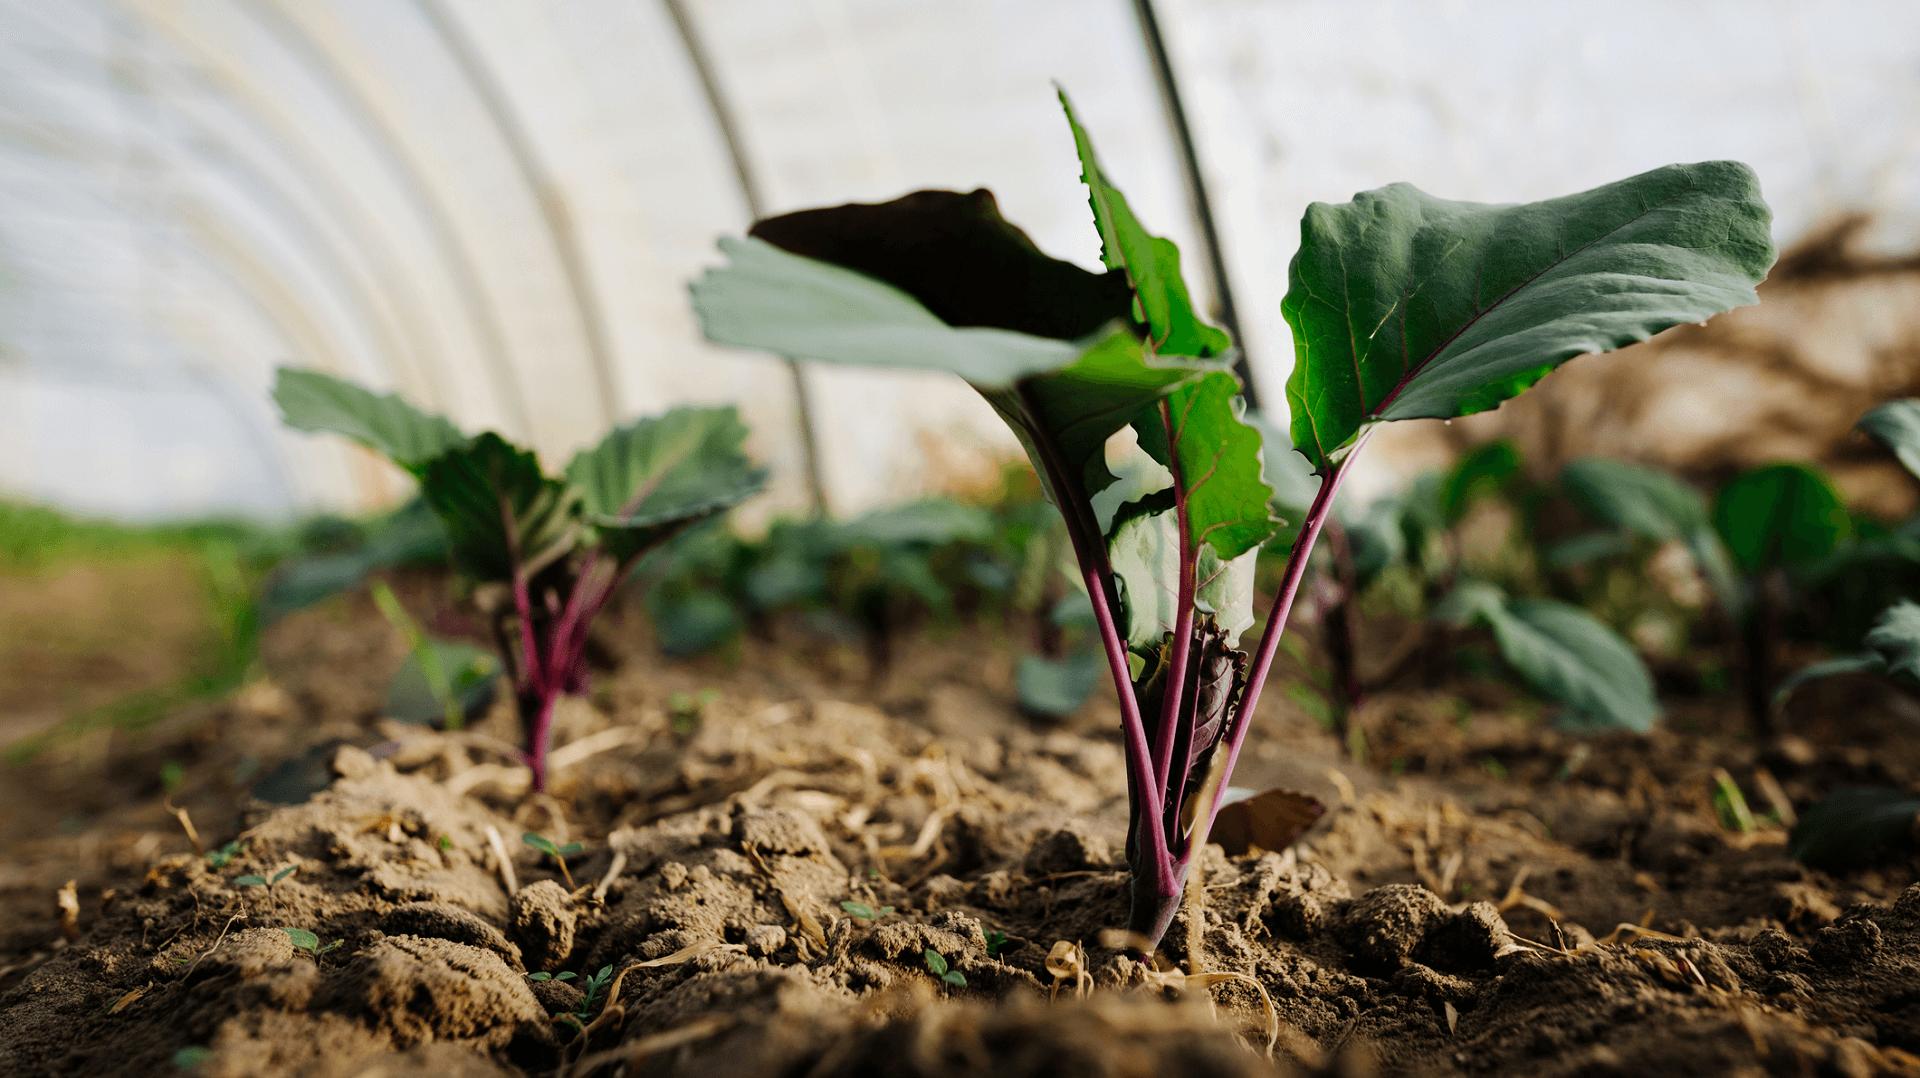 Kohlrabipflanze im Gewächshaus